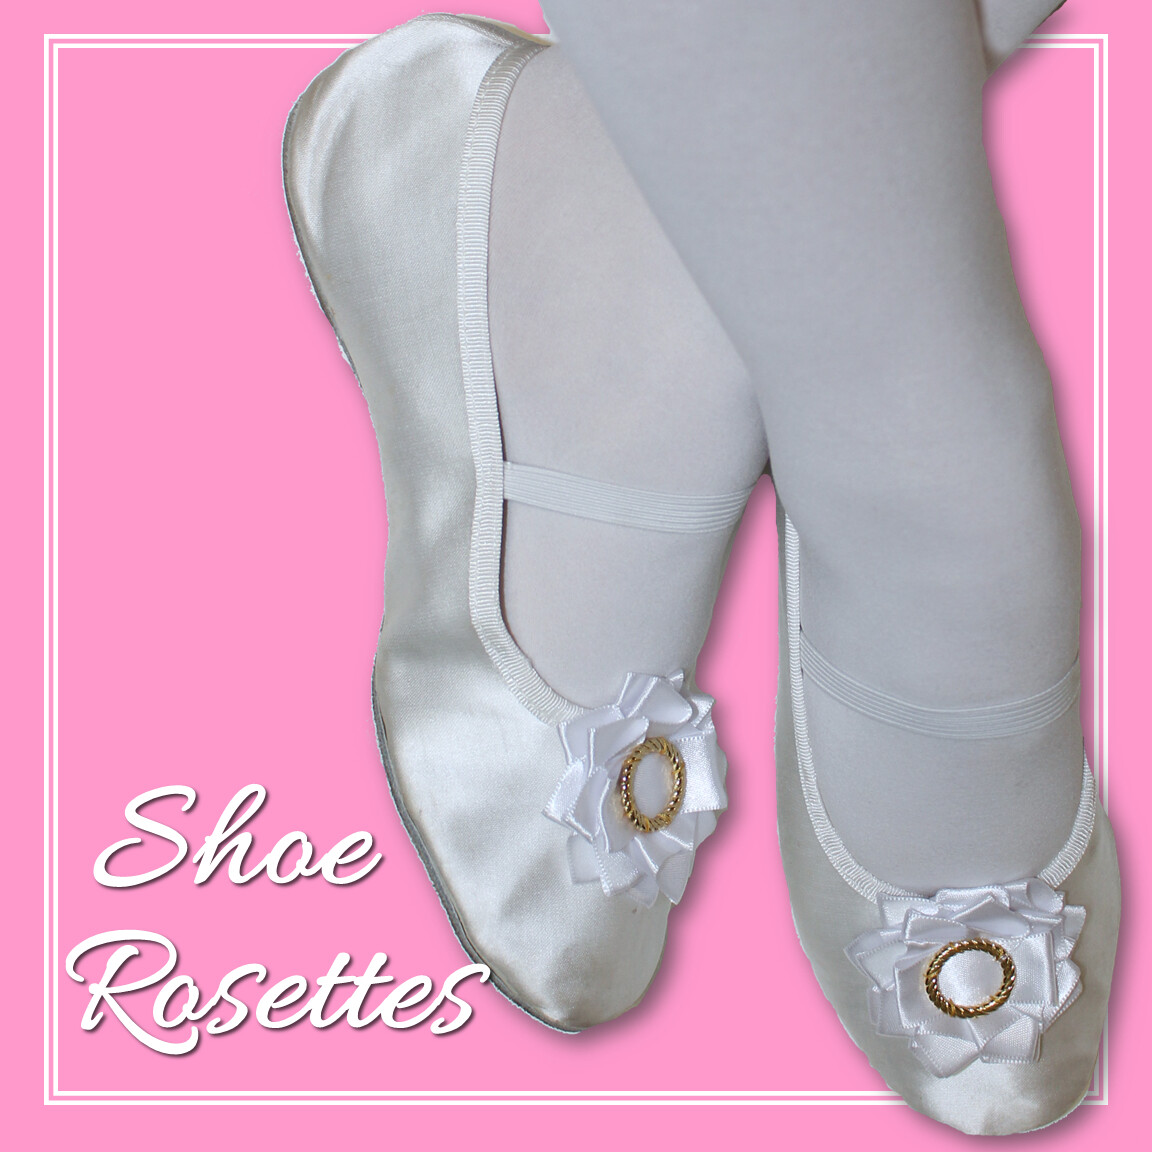 Shoe Rosettes